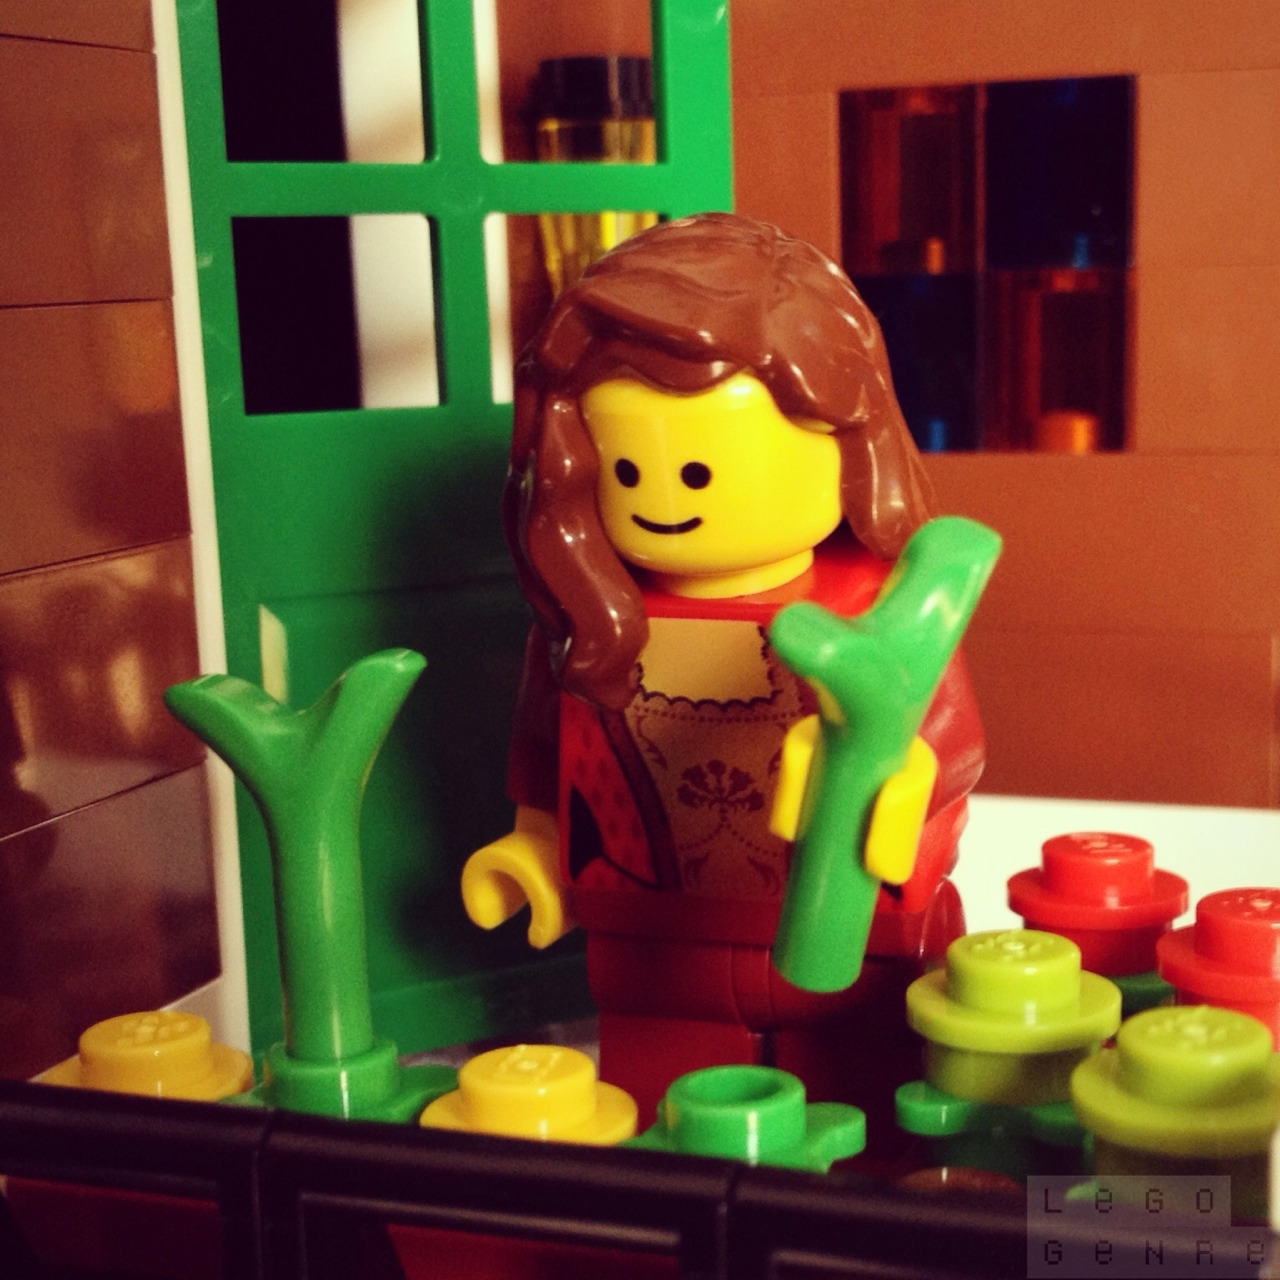 LegoGenre 00236: Springtime Gardening